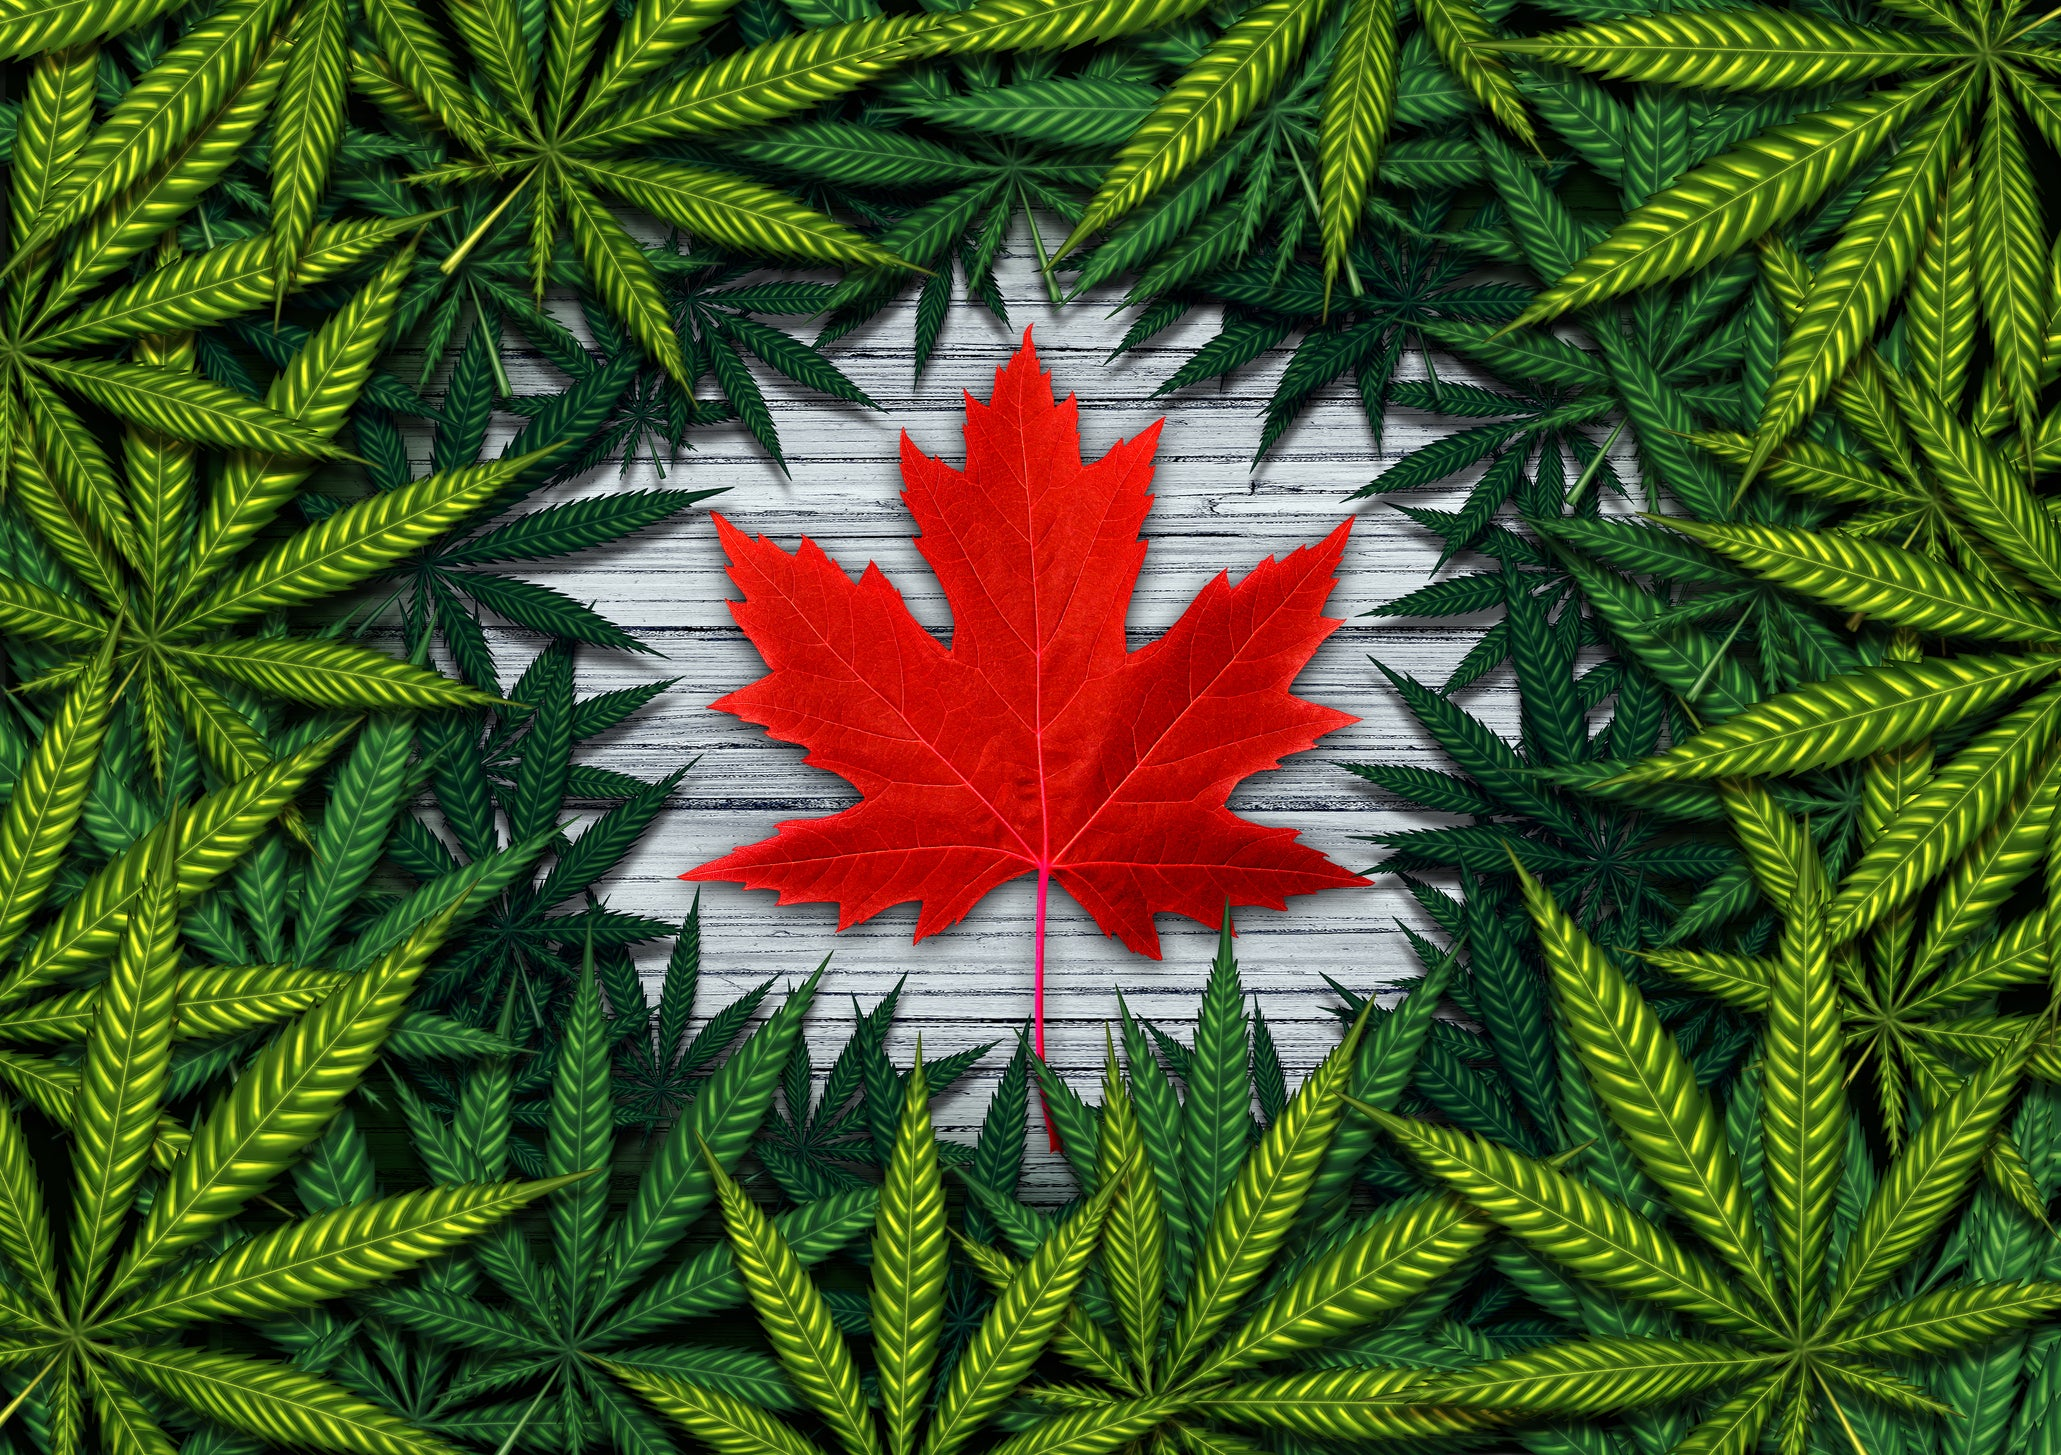 3 Top Canadian Marijuana Stocks to Buy in 2019 | The ...